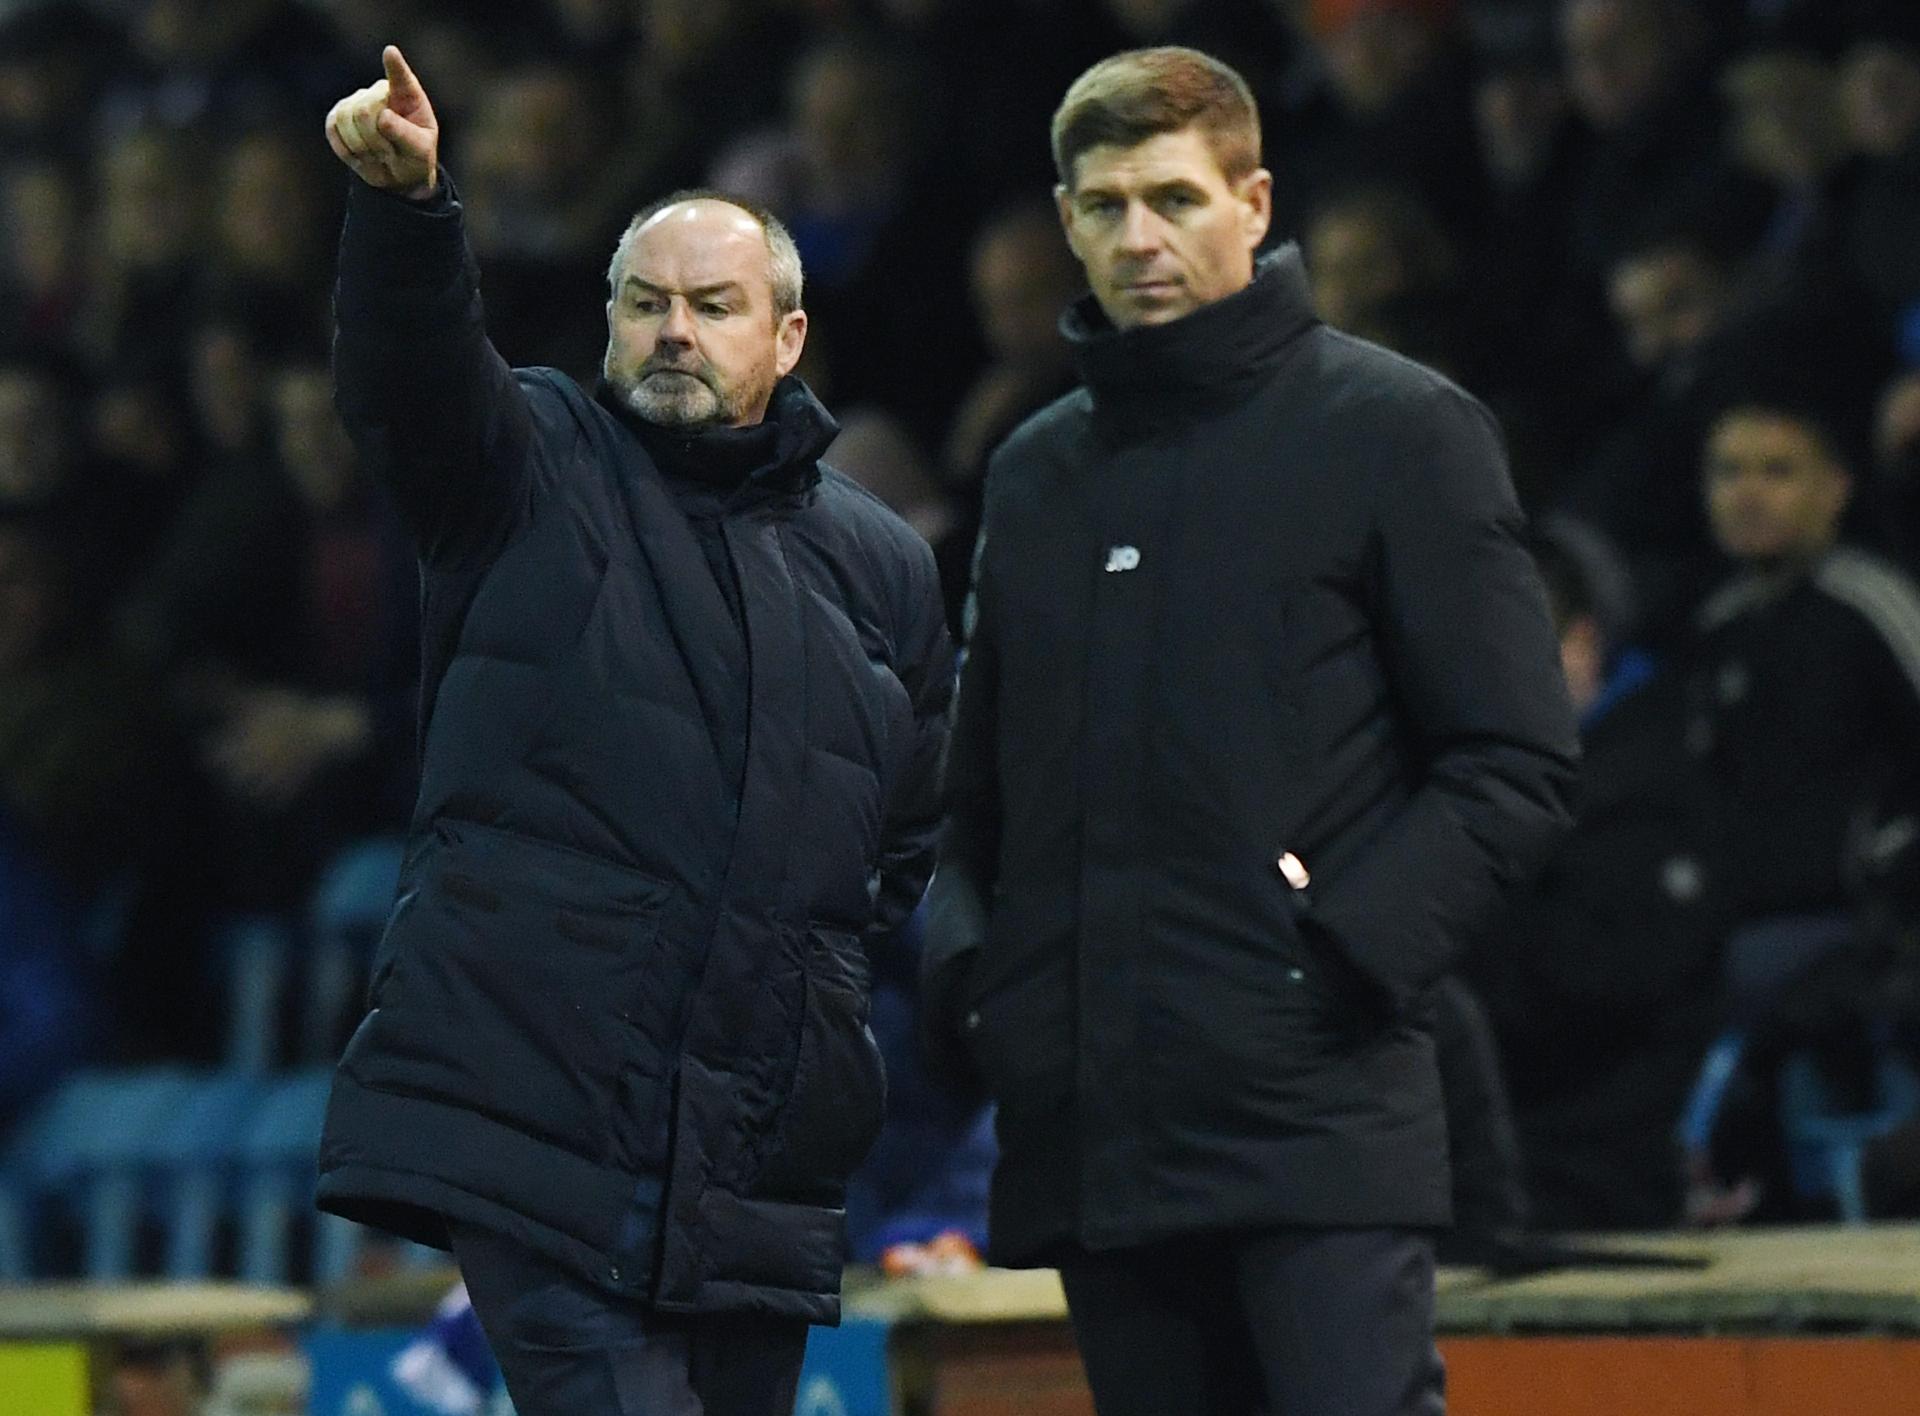 Live: Rangers v Kilmarnock, Scottish Cup fifth round replay